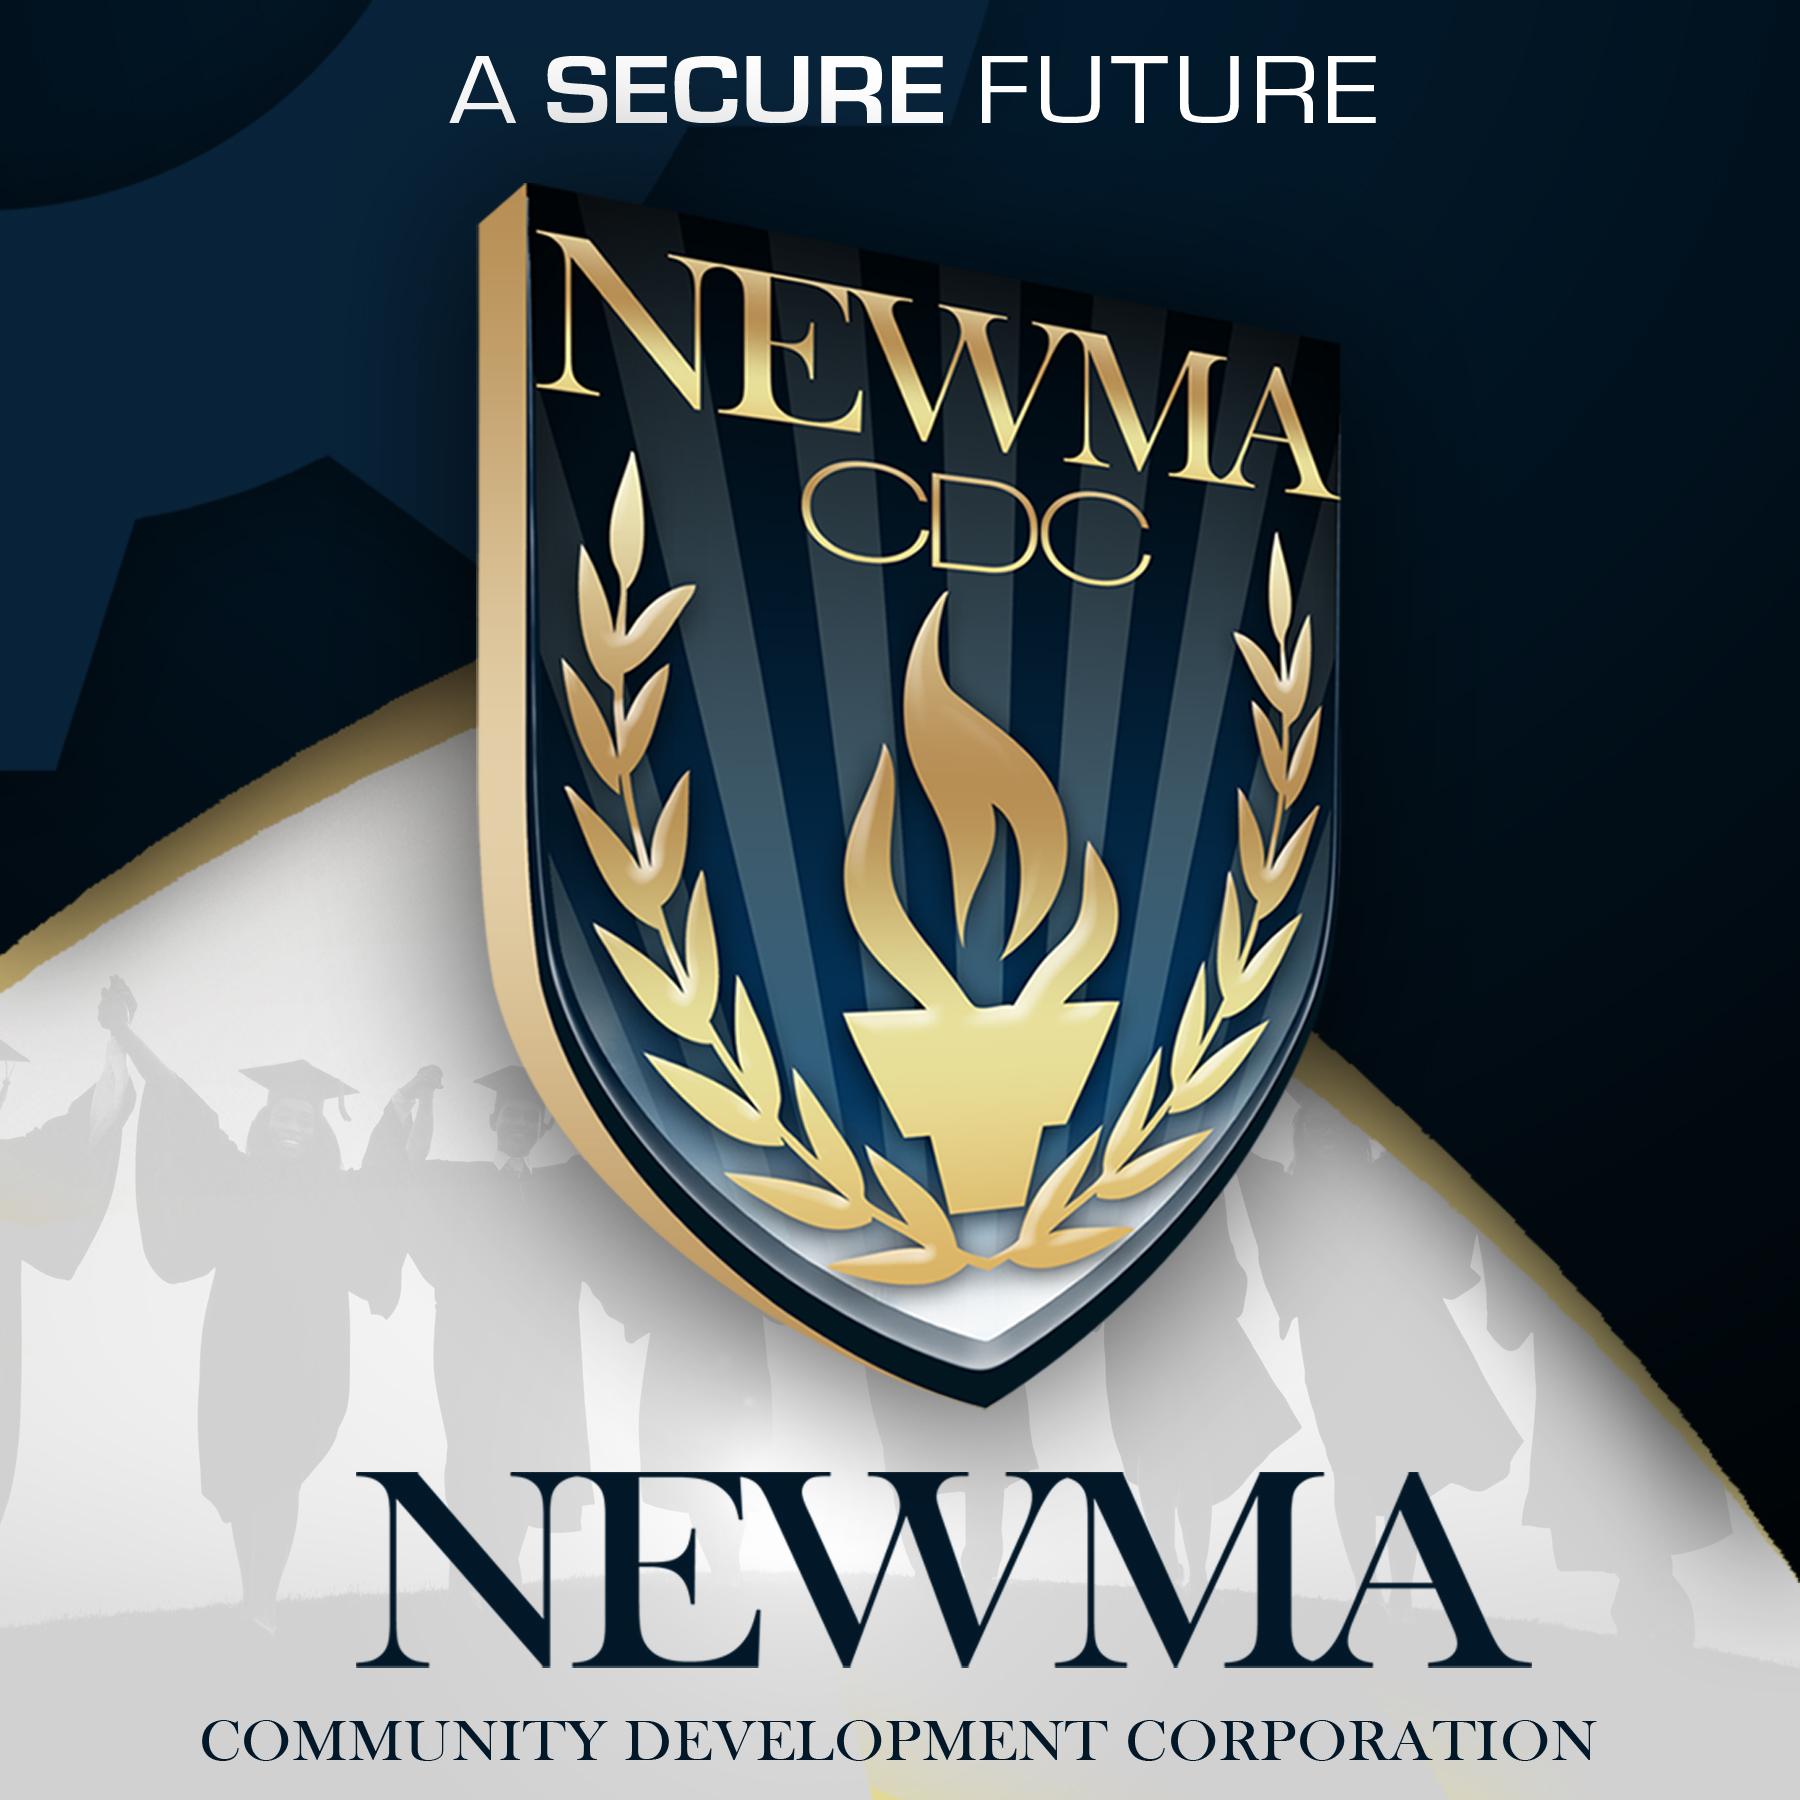 NEWMA Community Development Corporation